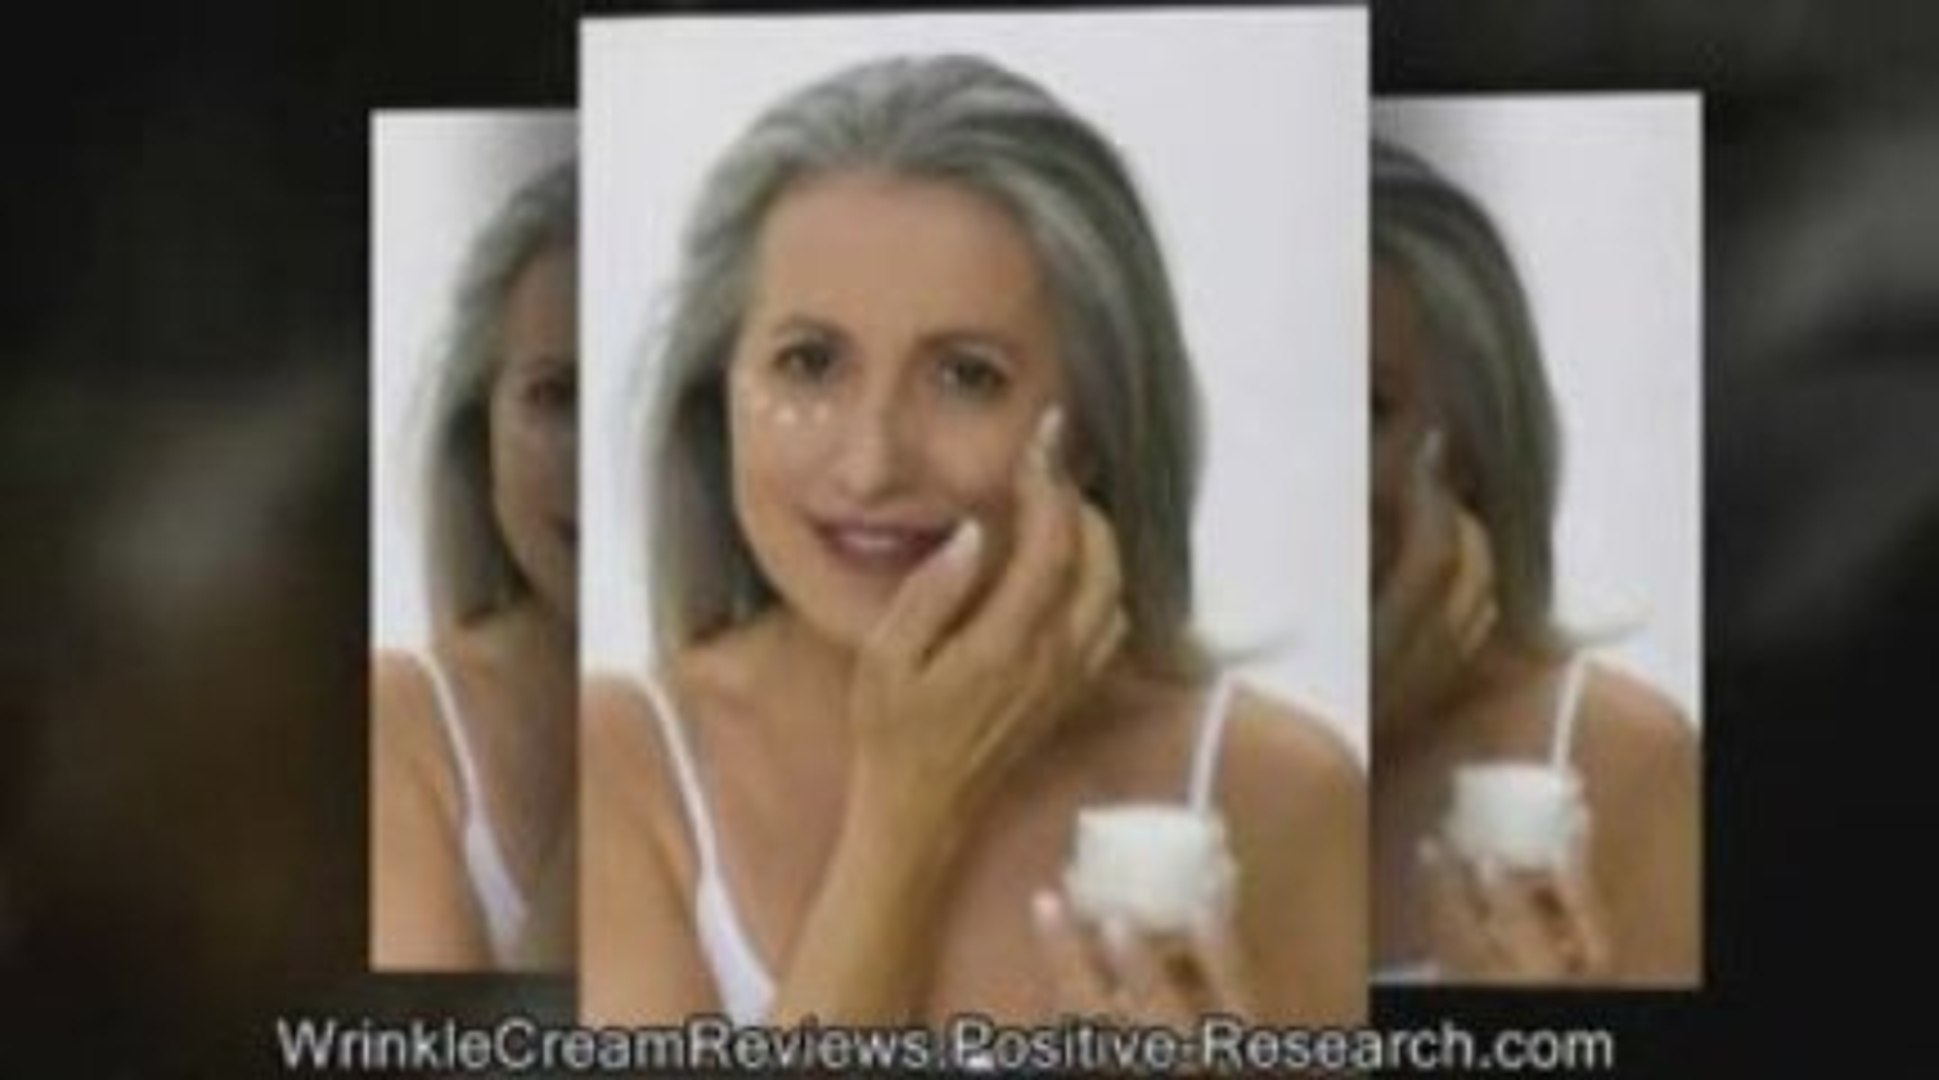 Remove Wrinkle Cream Reviews